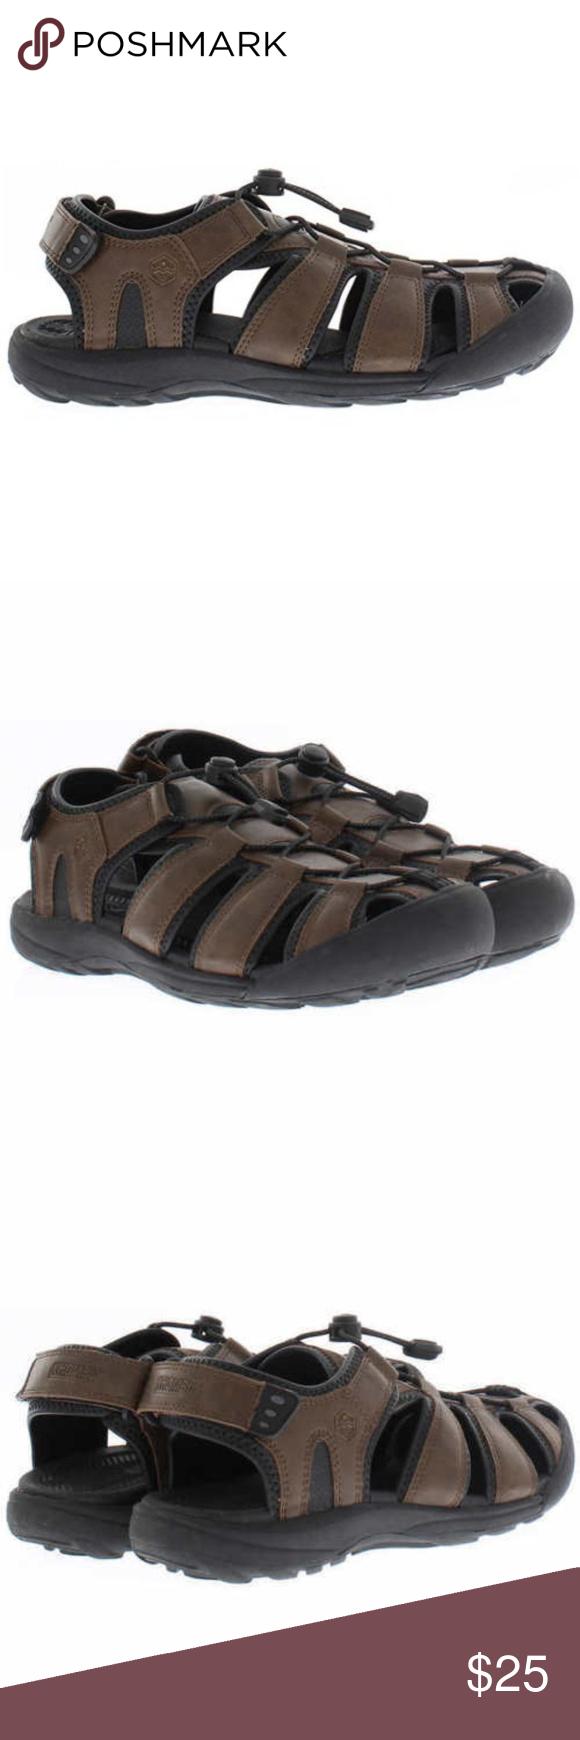 0d1d8c3d760 Men s Khombu Travis Active Sandal Brown Khombu Adjustable heel strap for  optimal fit durable traction outsole